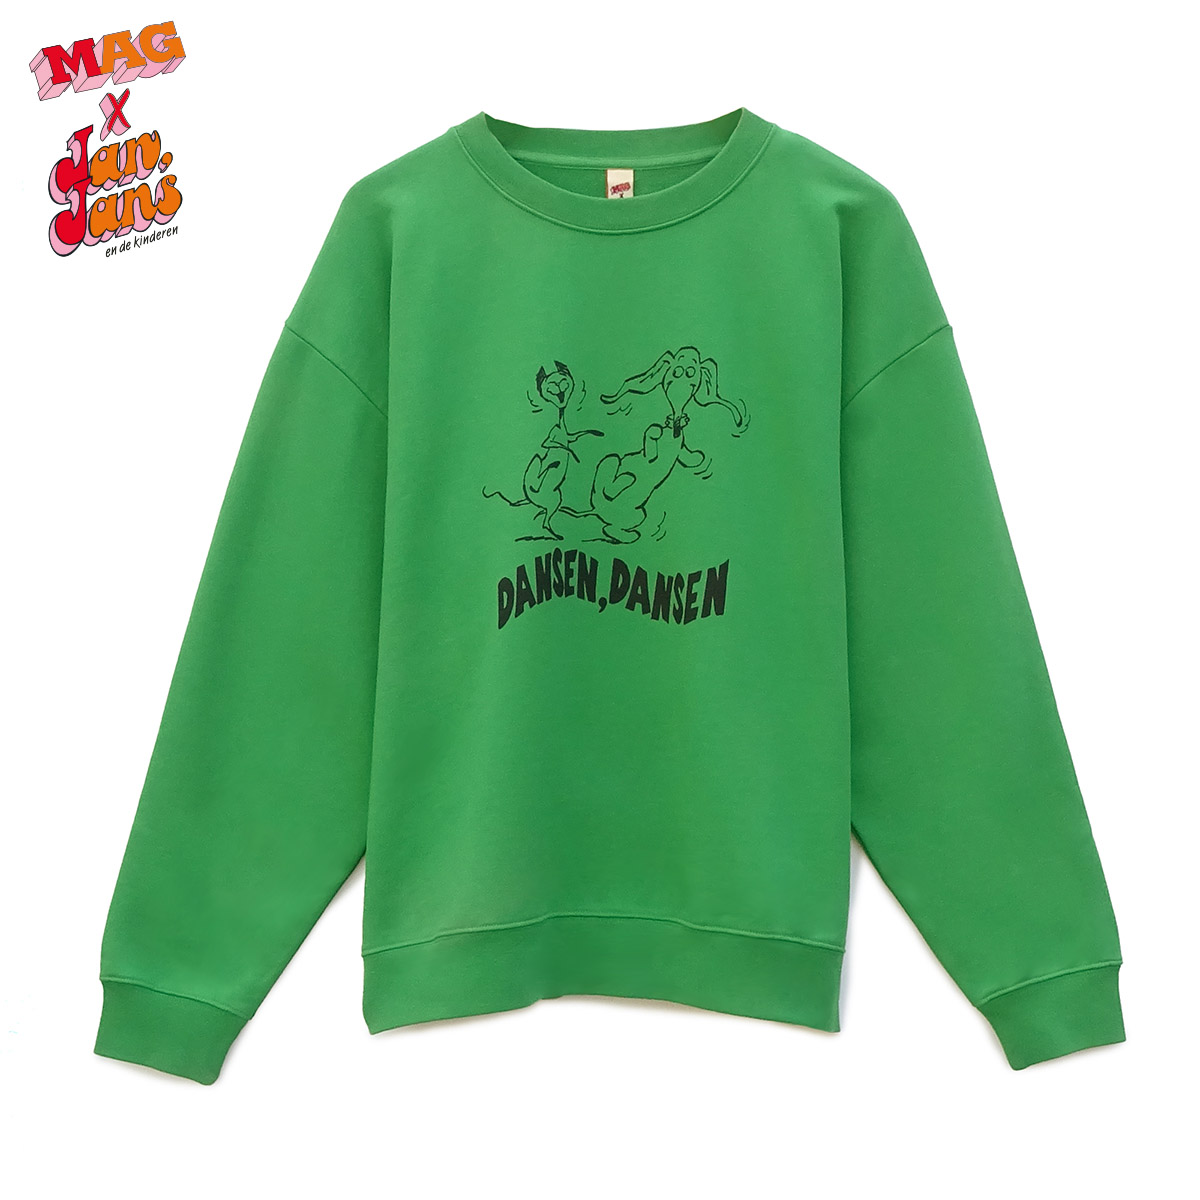 8802 Dansen Dansen Lime-Green